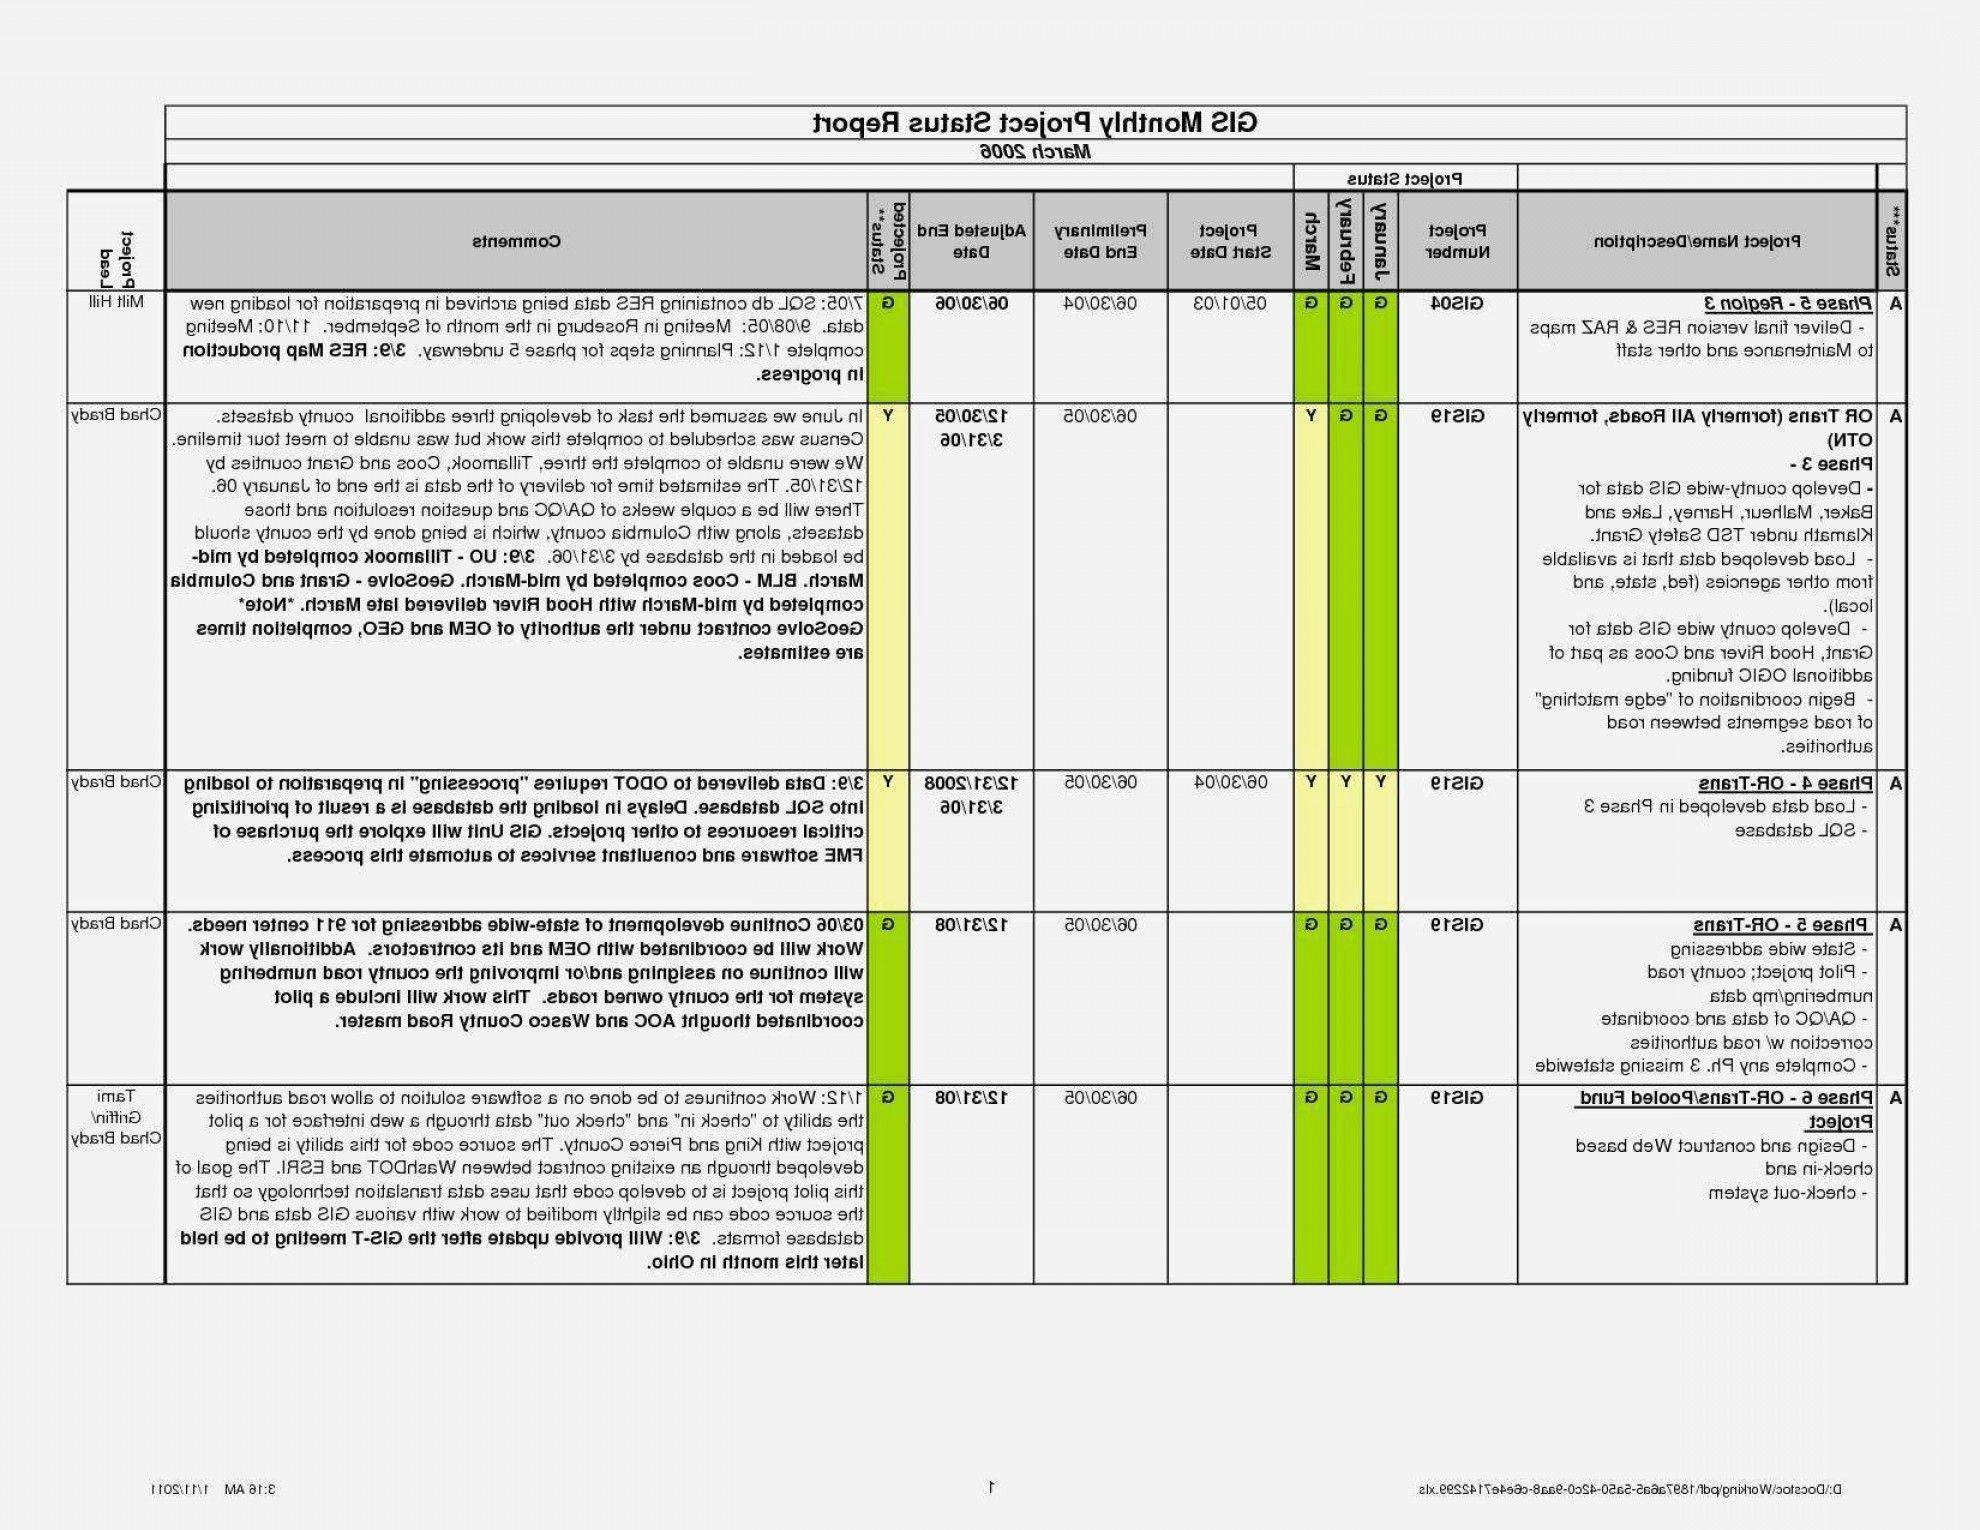 000 Impressive Project Management Statu Report Template Excel High Definition  Gantt 2016 ProgresFull